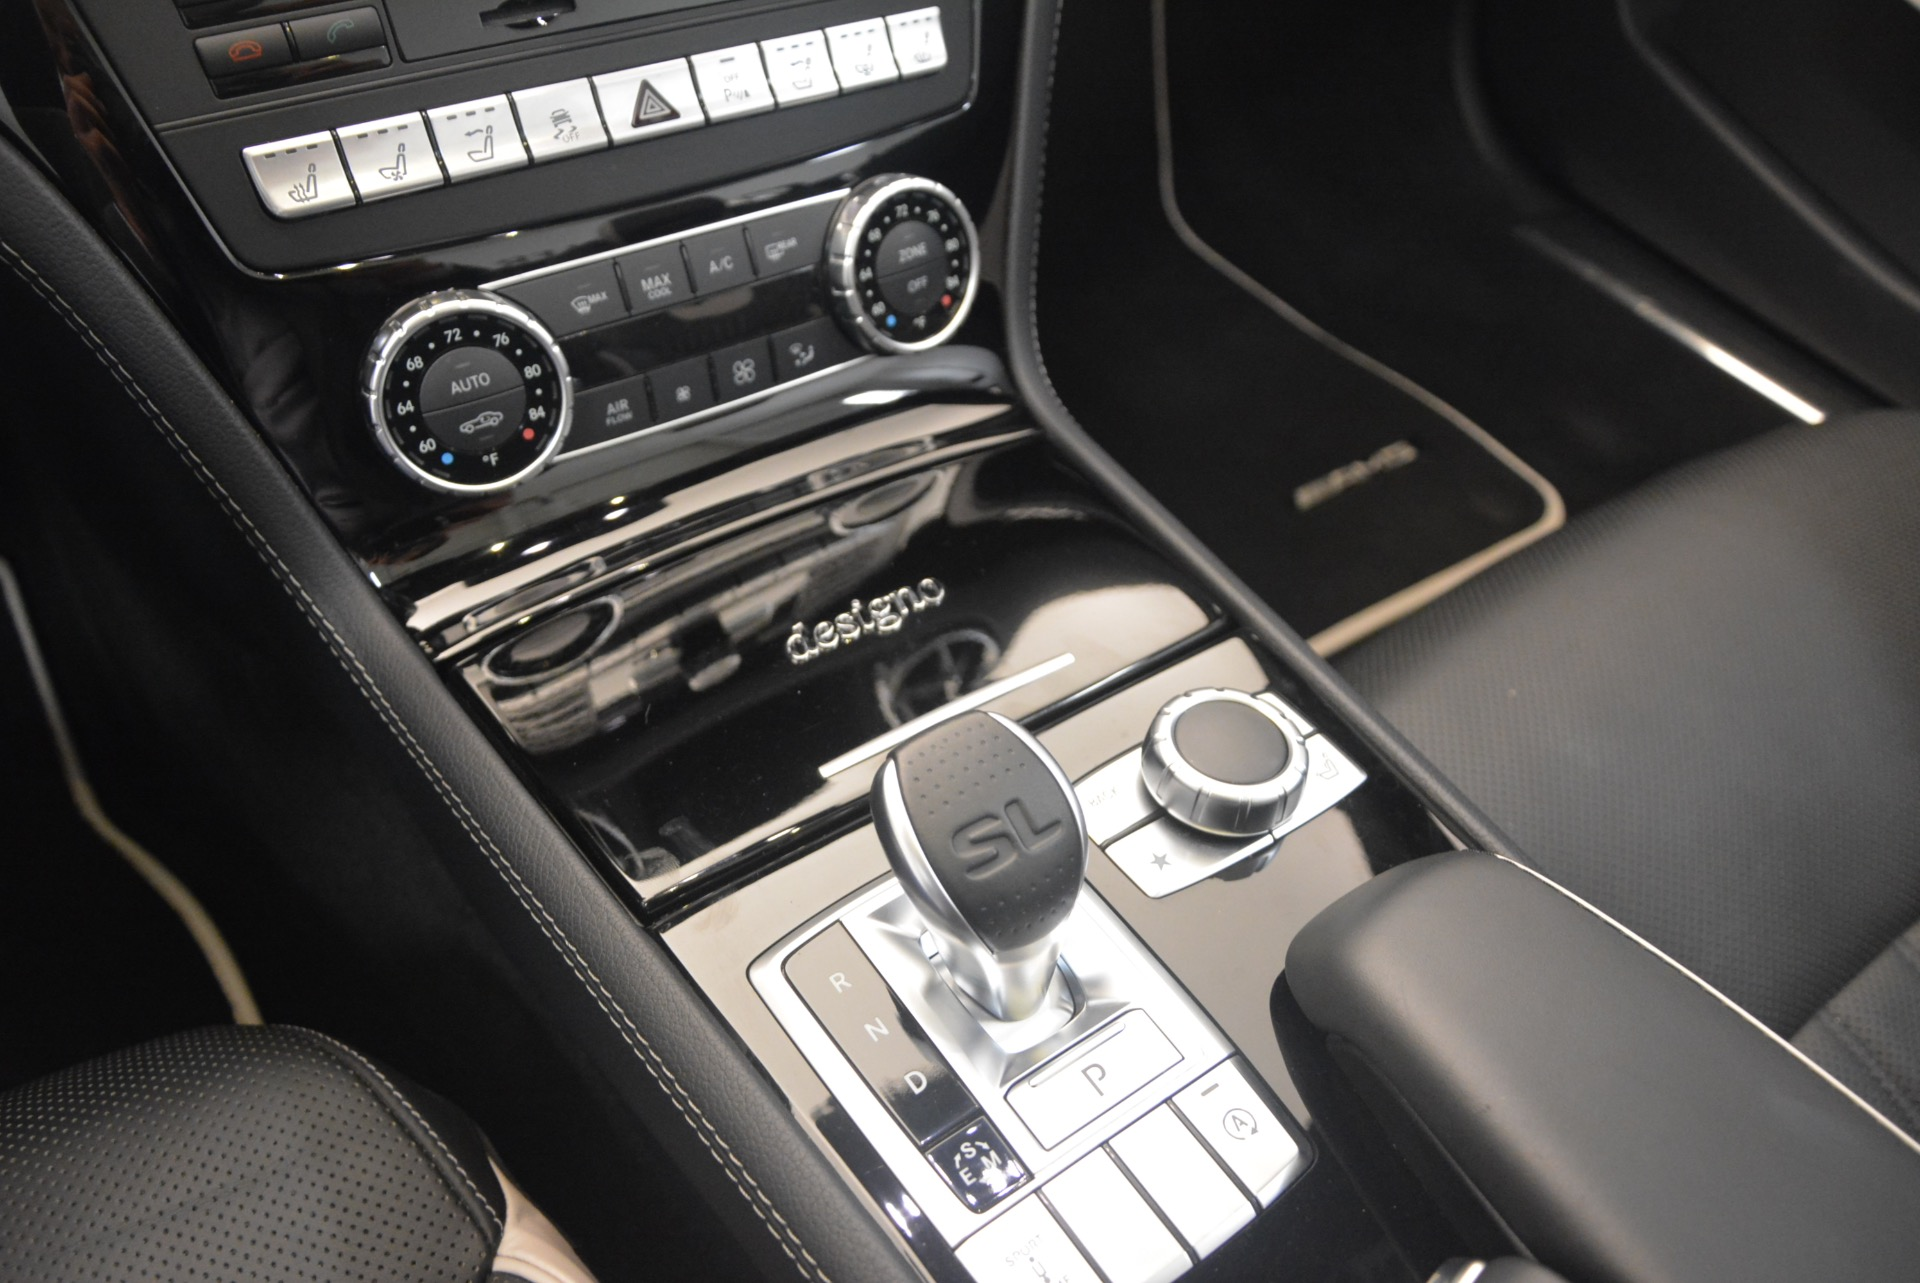 Used 2015 Mercedes Benz SL-Class SL 550 For Sale In Greenwich, CT. Alfa Romeo of Greenwich, M1874A 1261_p35